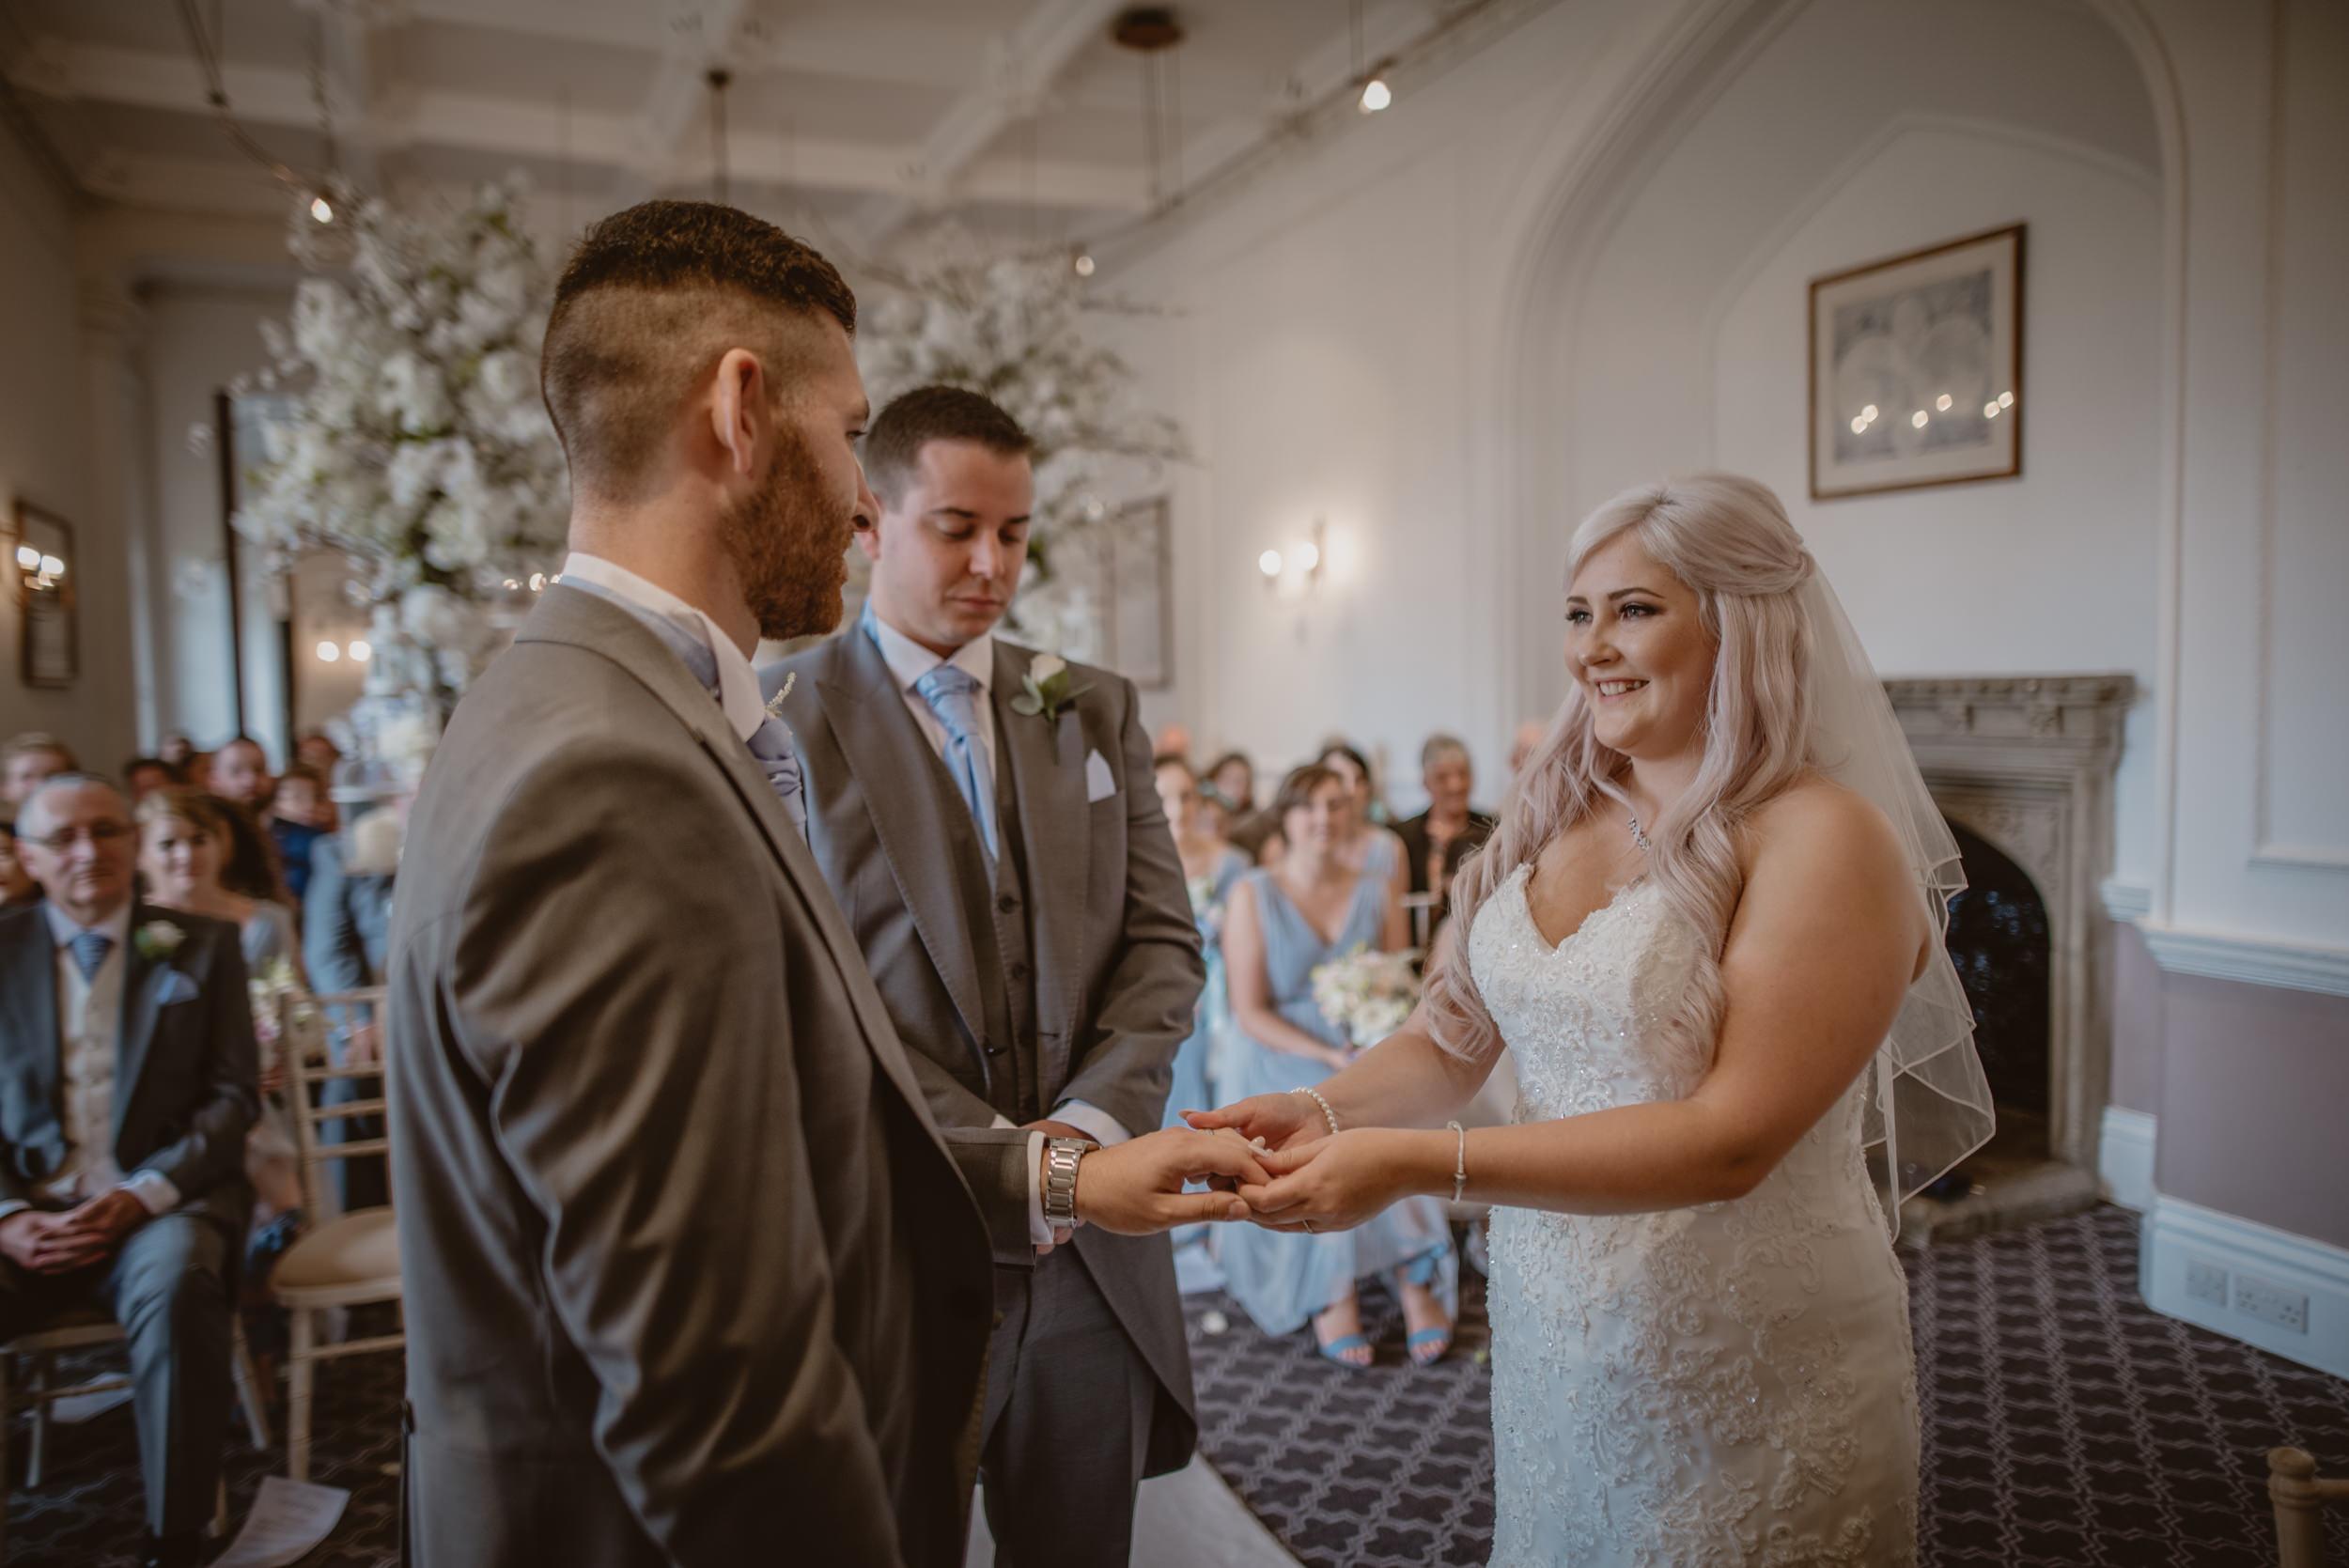 Rachel-and-James-Wedding-Horsley-Towers-State-Manu-Mendoza-Wedding-Photography-265.jpg